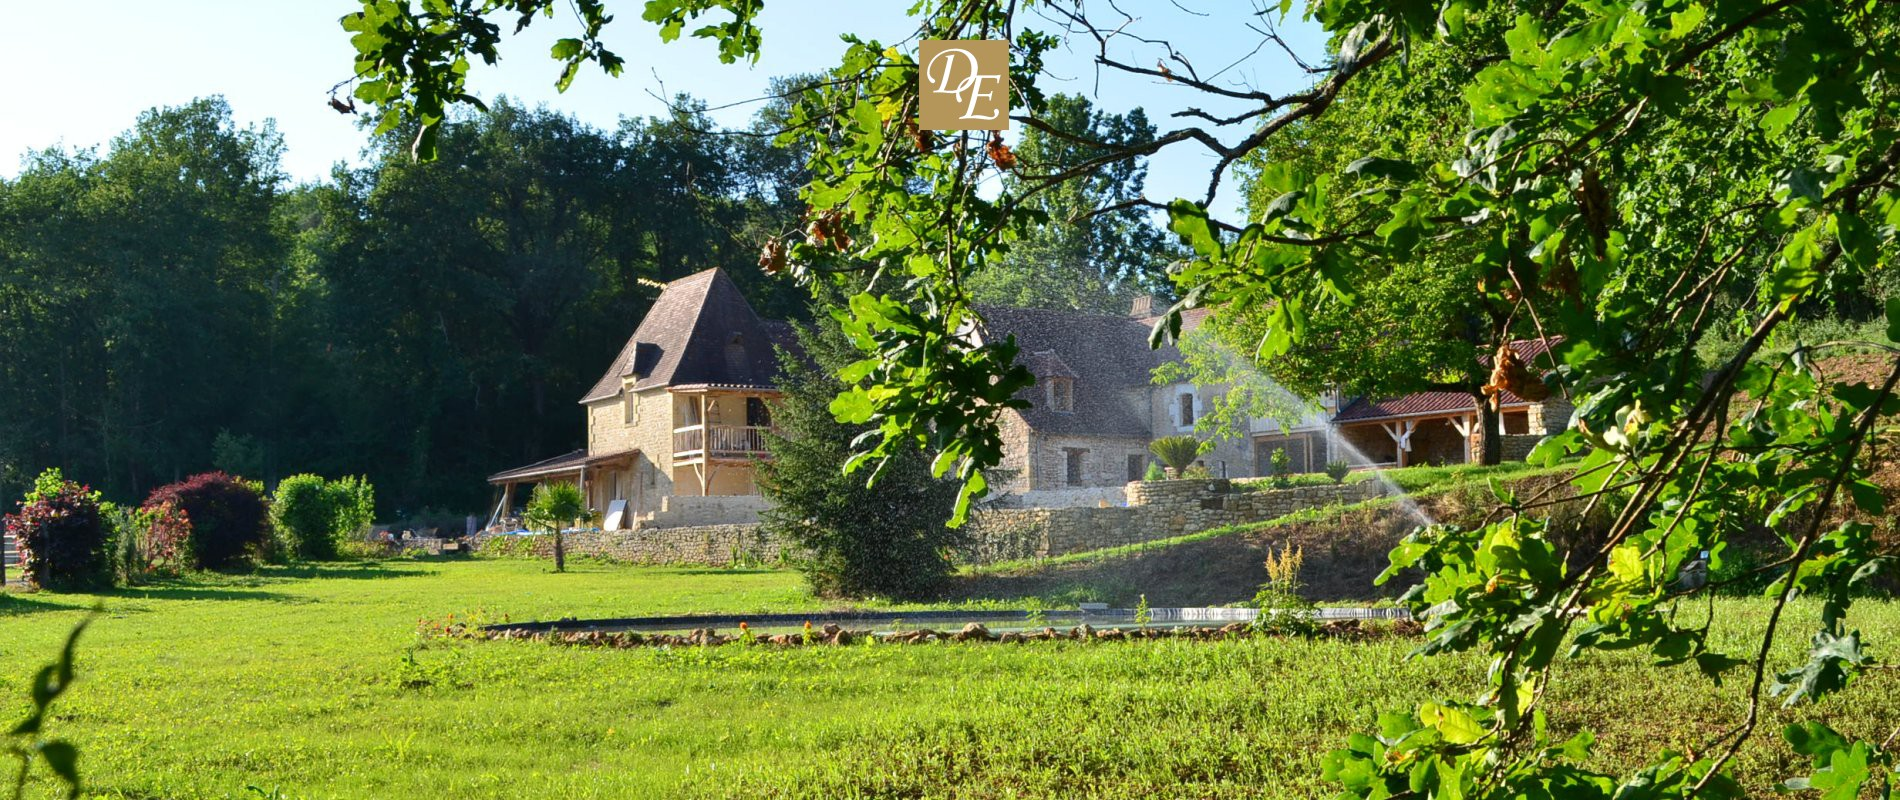 Chambre dhte grand confort avec chemine jacuzzi  piscine chauffe en Dordogne